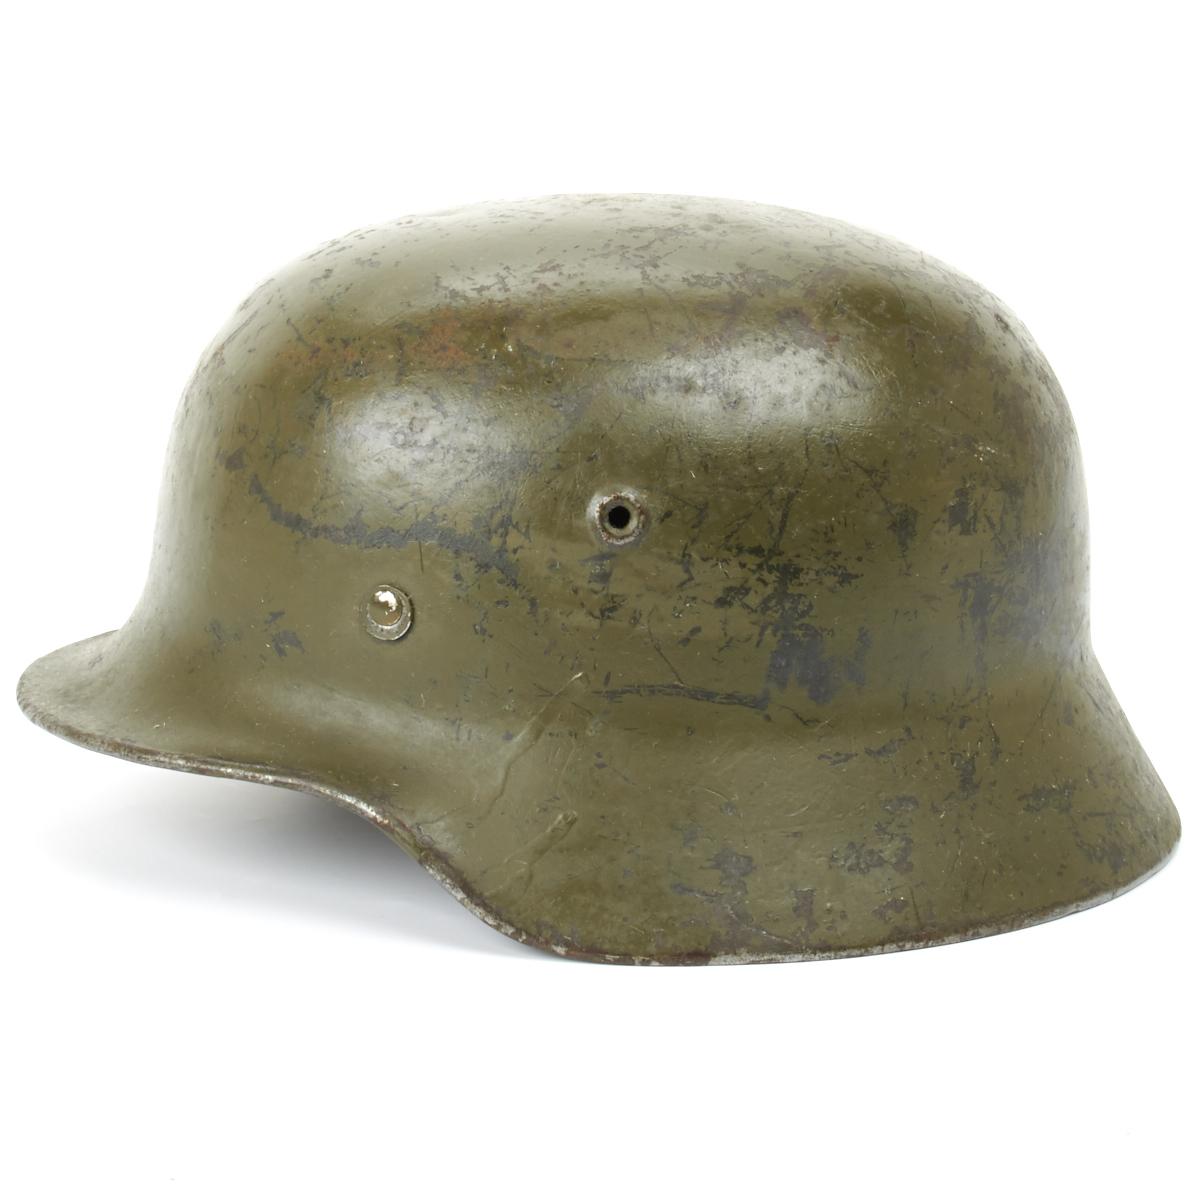 German Helmets of World War II: History and Description